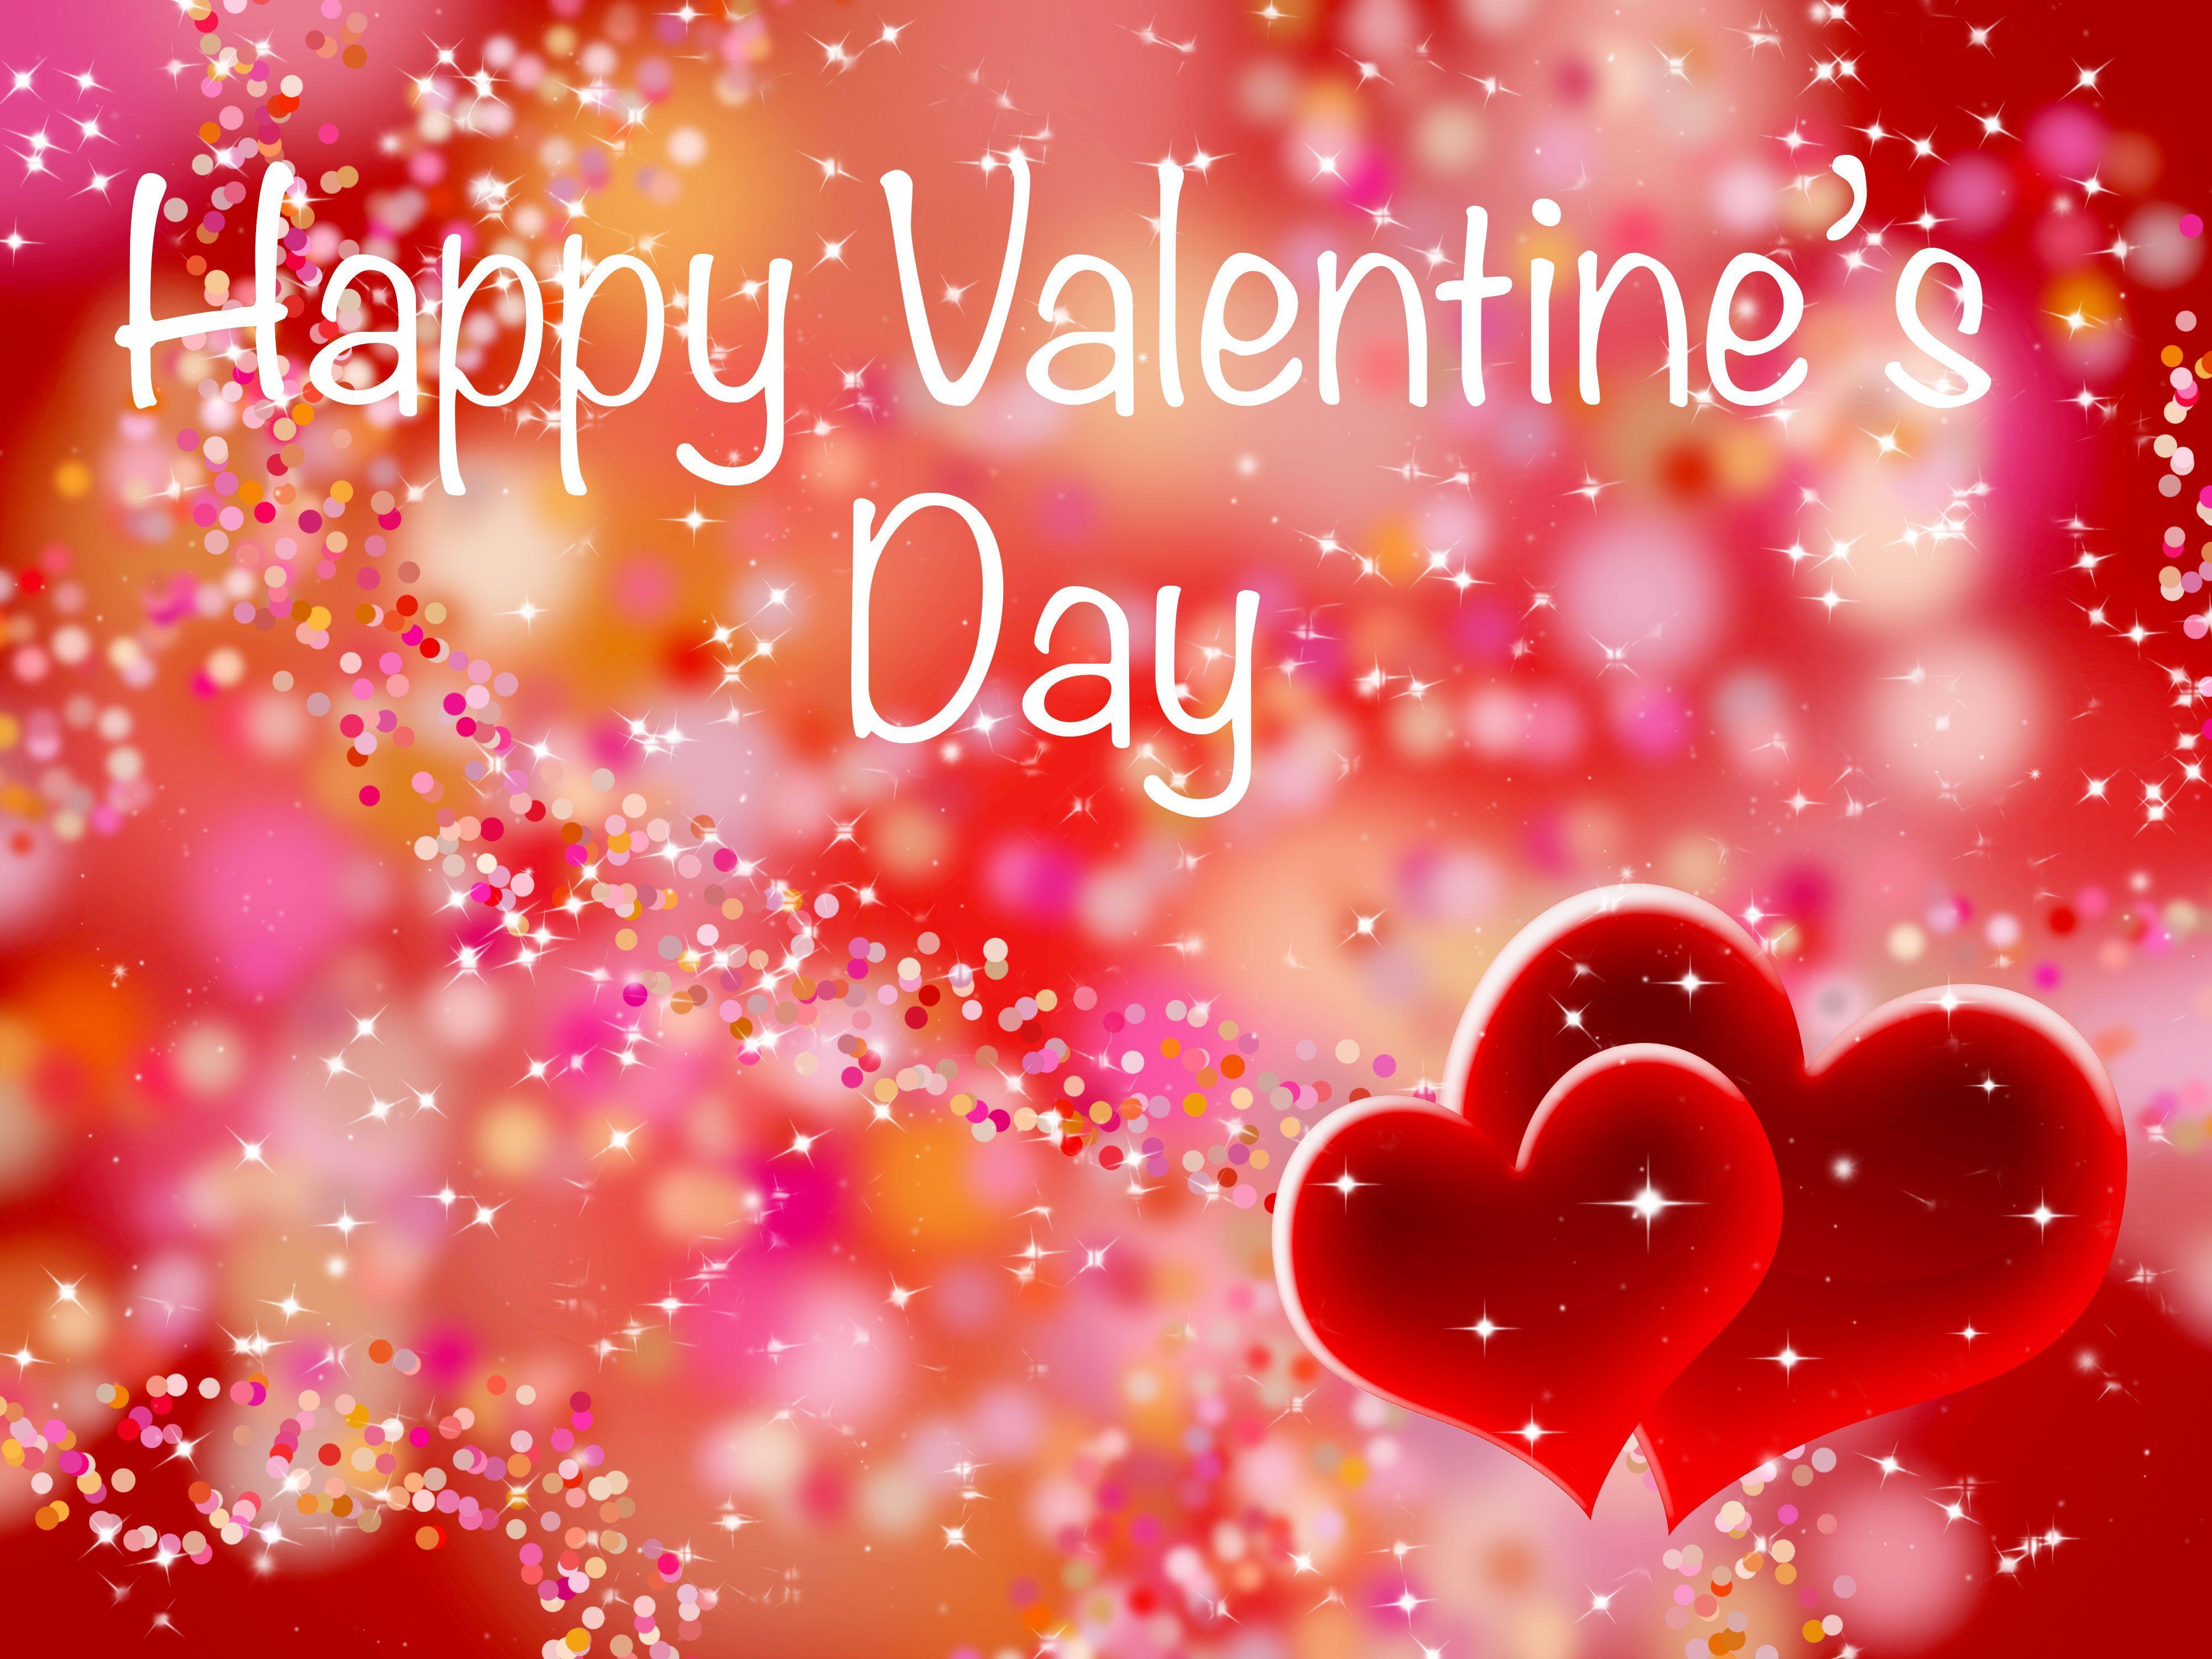 4000x3000 Happy Valentine's Day HD Wallpaper, Background & Picture